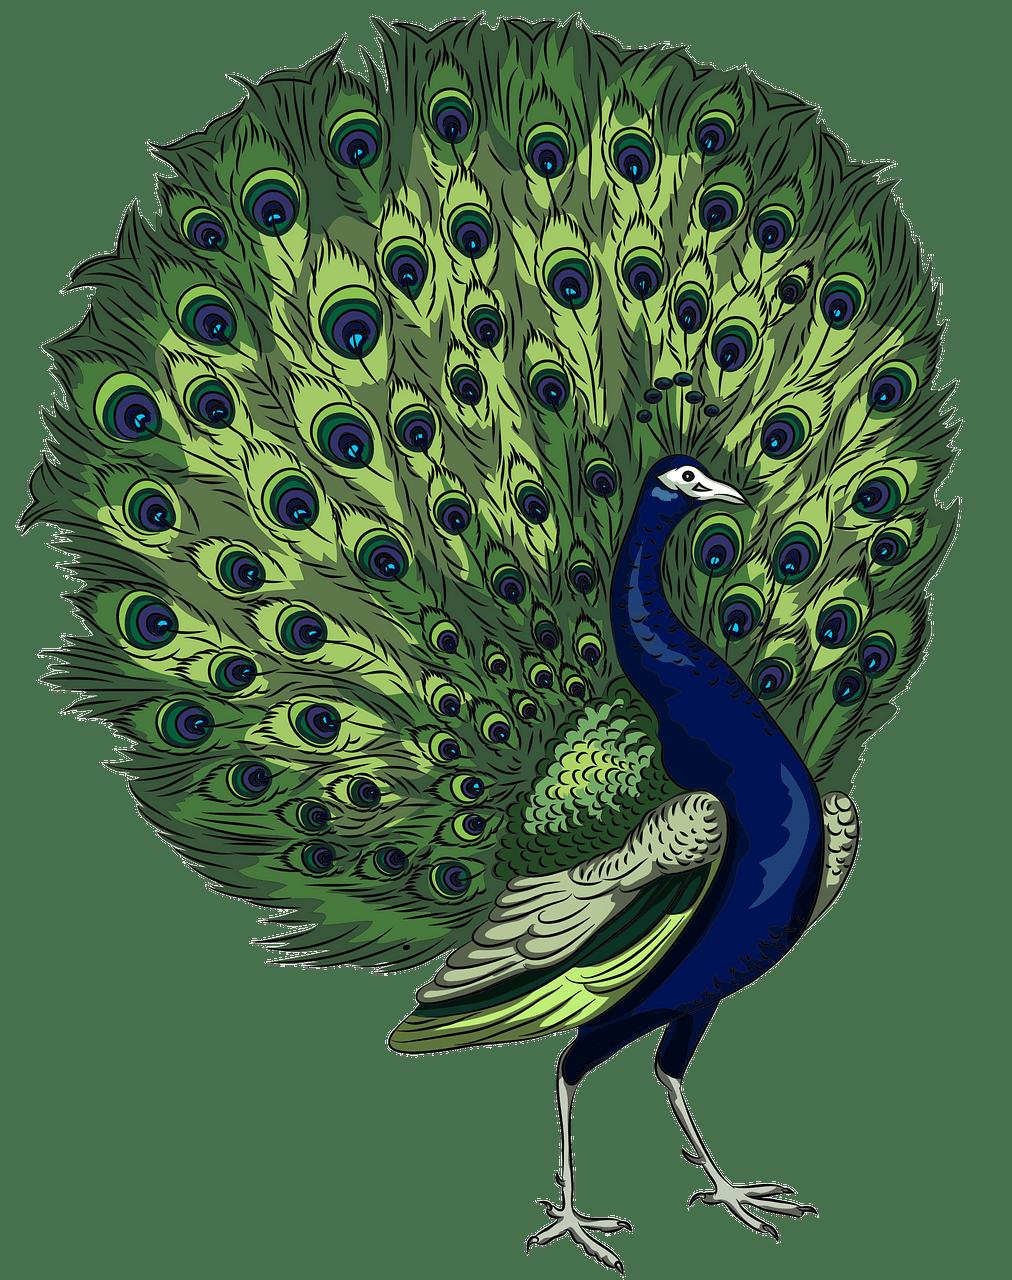 clip art Free download creazilla . Peacock clipart.